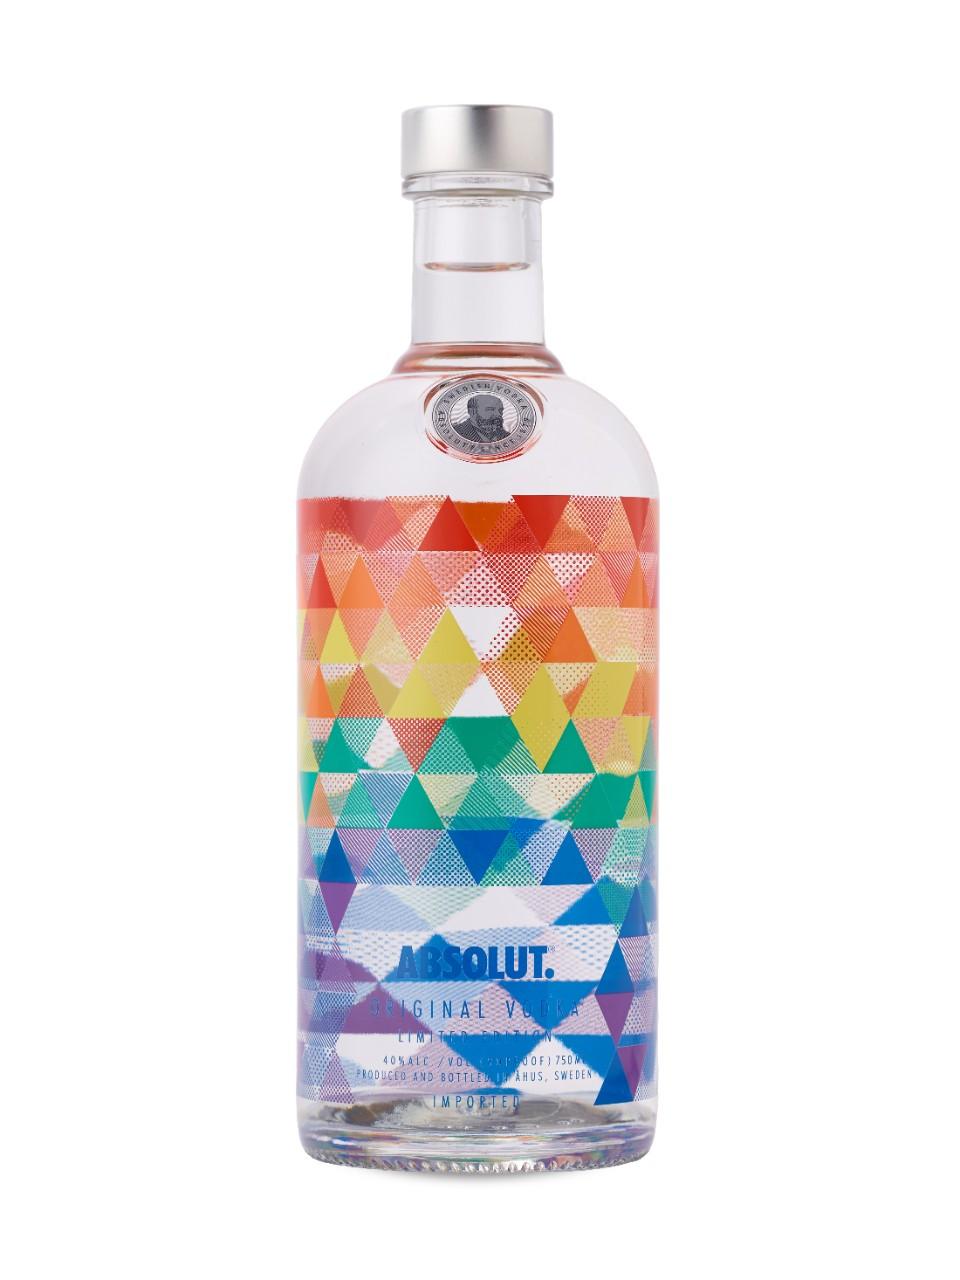 Vodka Andy Limited Edition 1Litro Absolut garrafa UN